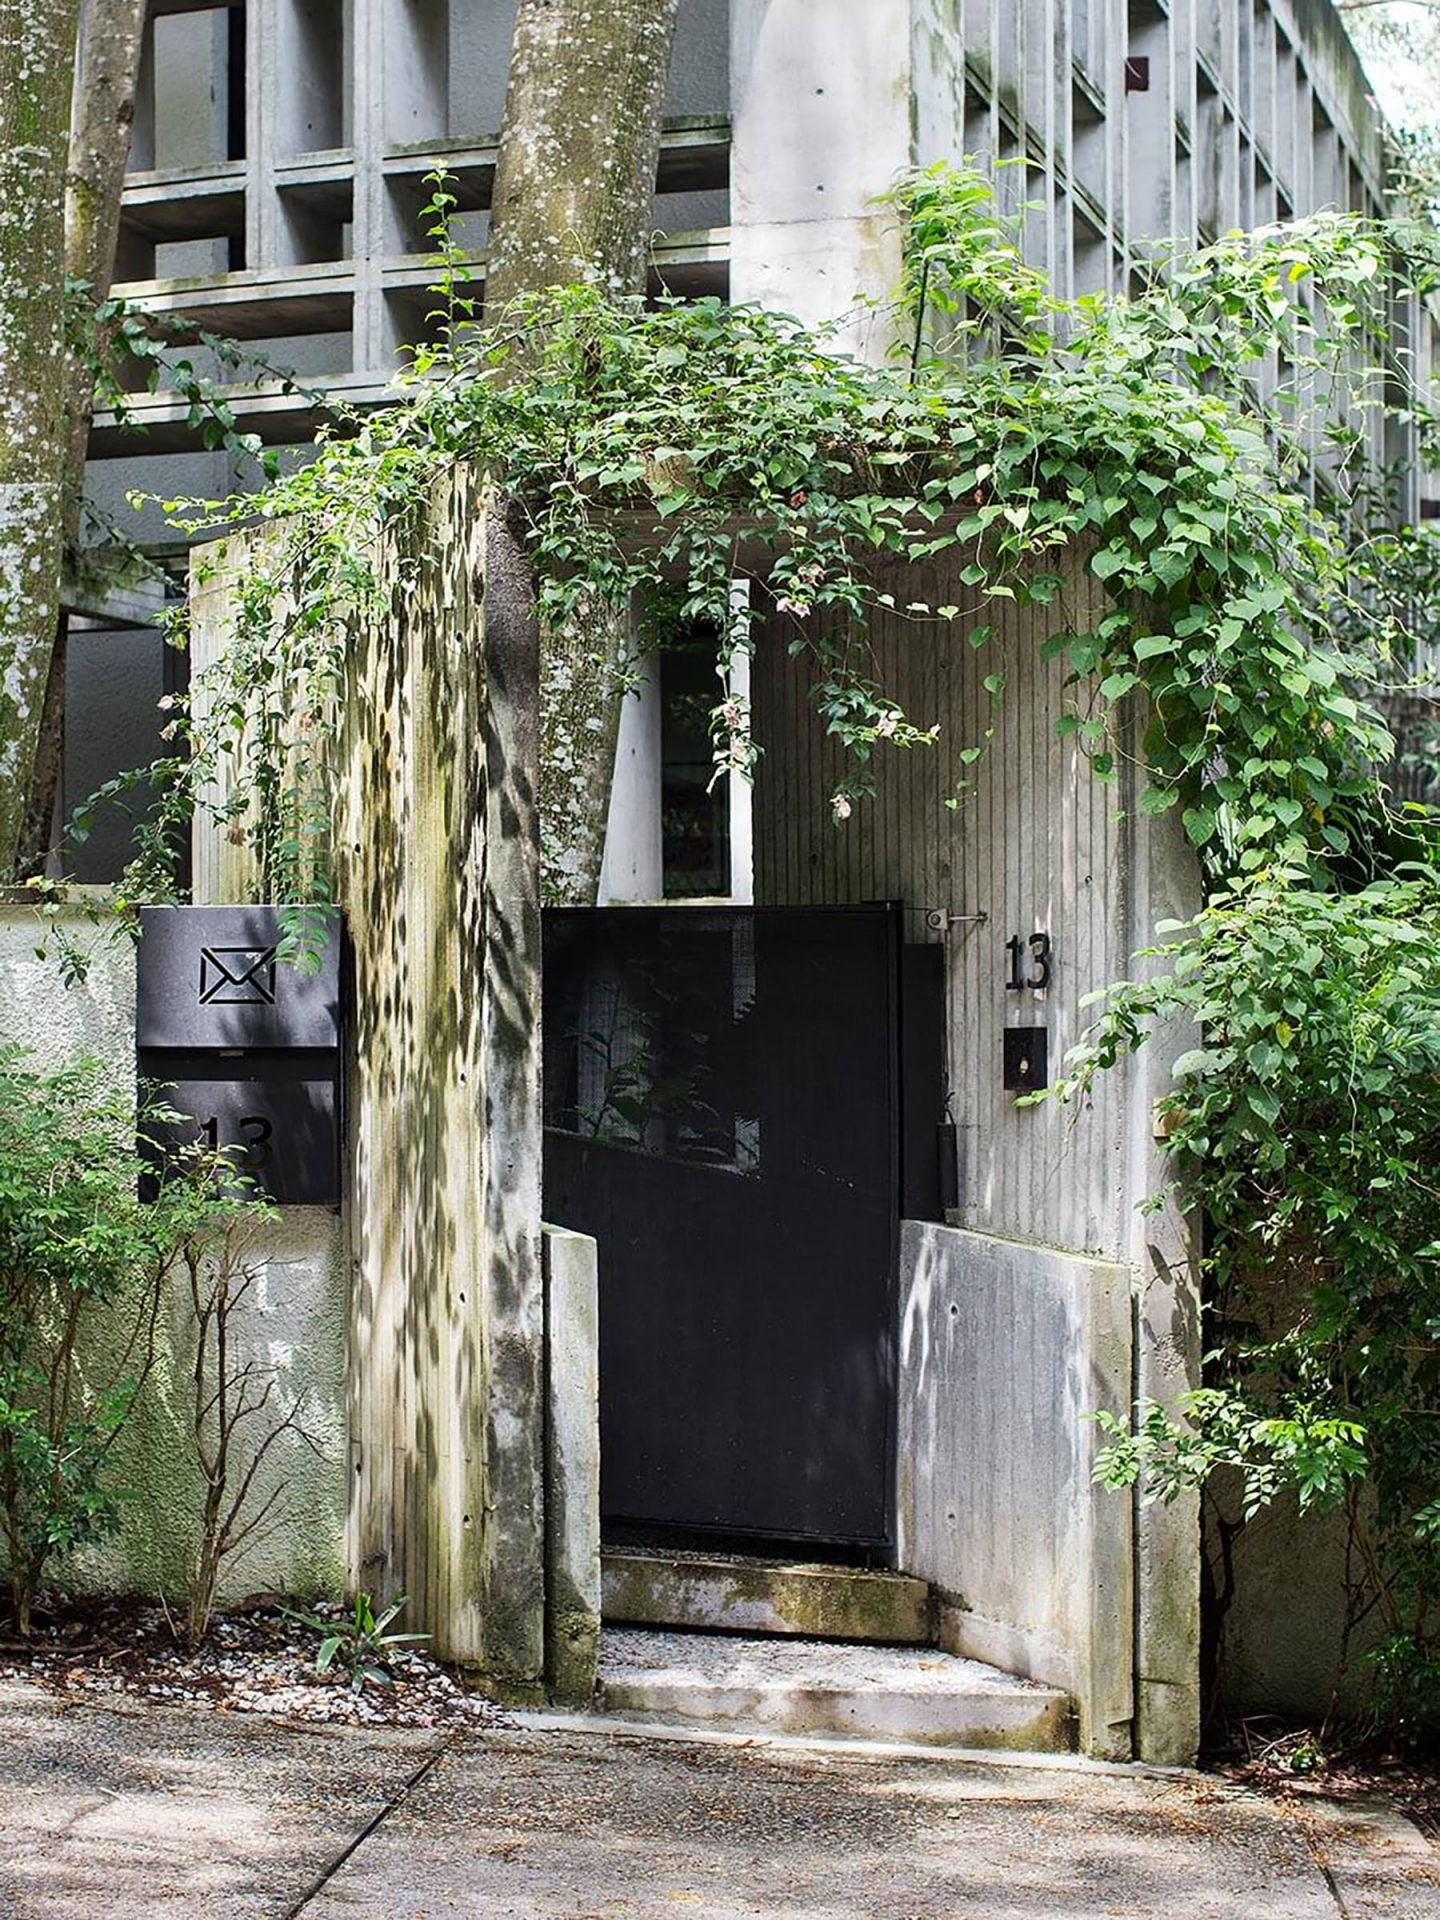 iGNANT-Architecture-Ben-Hosking-Chempenai-004